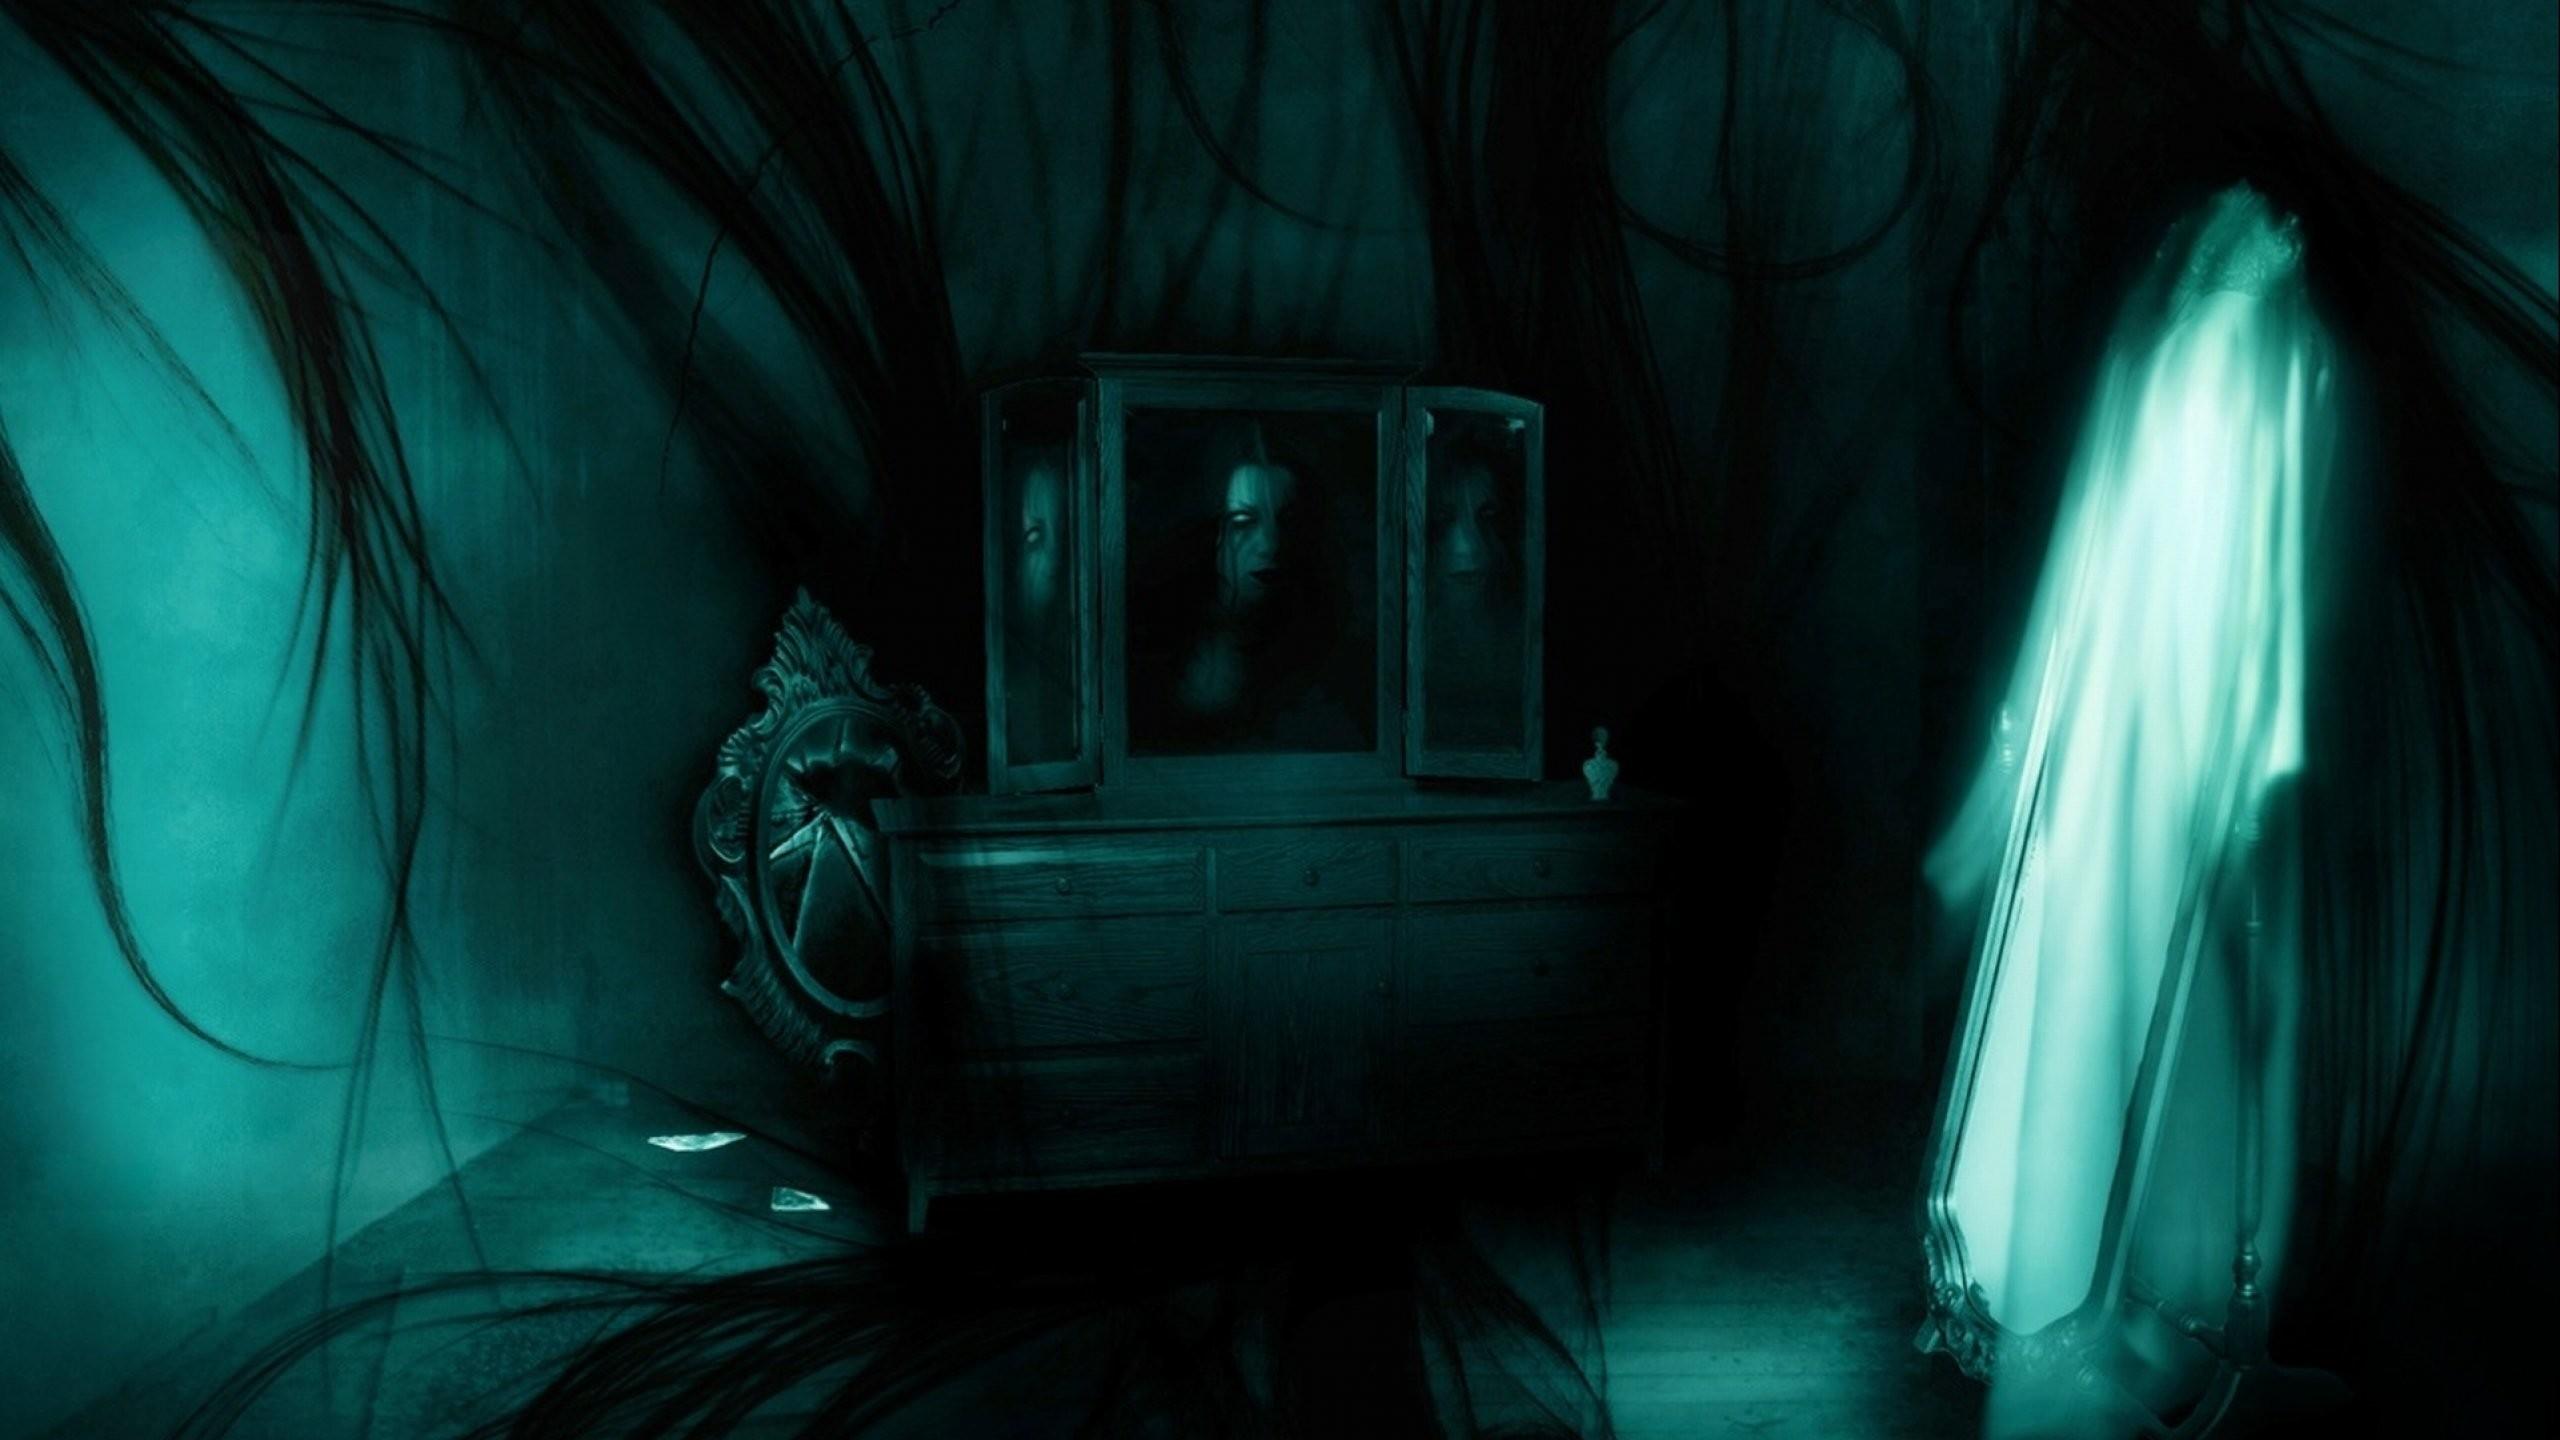 horror dream Q horror por un momento lo odie pero despues dije   ''no puedo odiarte eres demaciado horror~dream - wordpress themes is proudly powered by wordpress and themed by mukkamu.